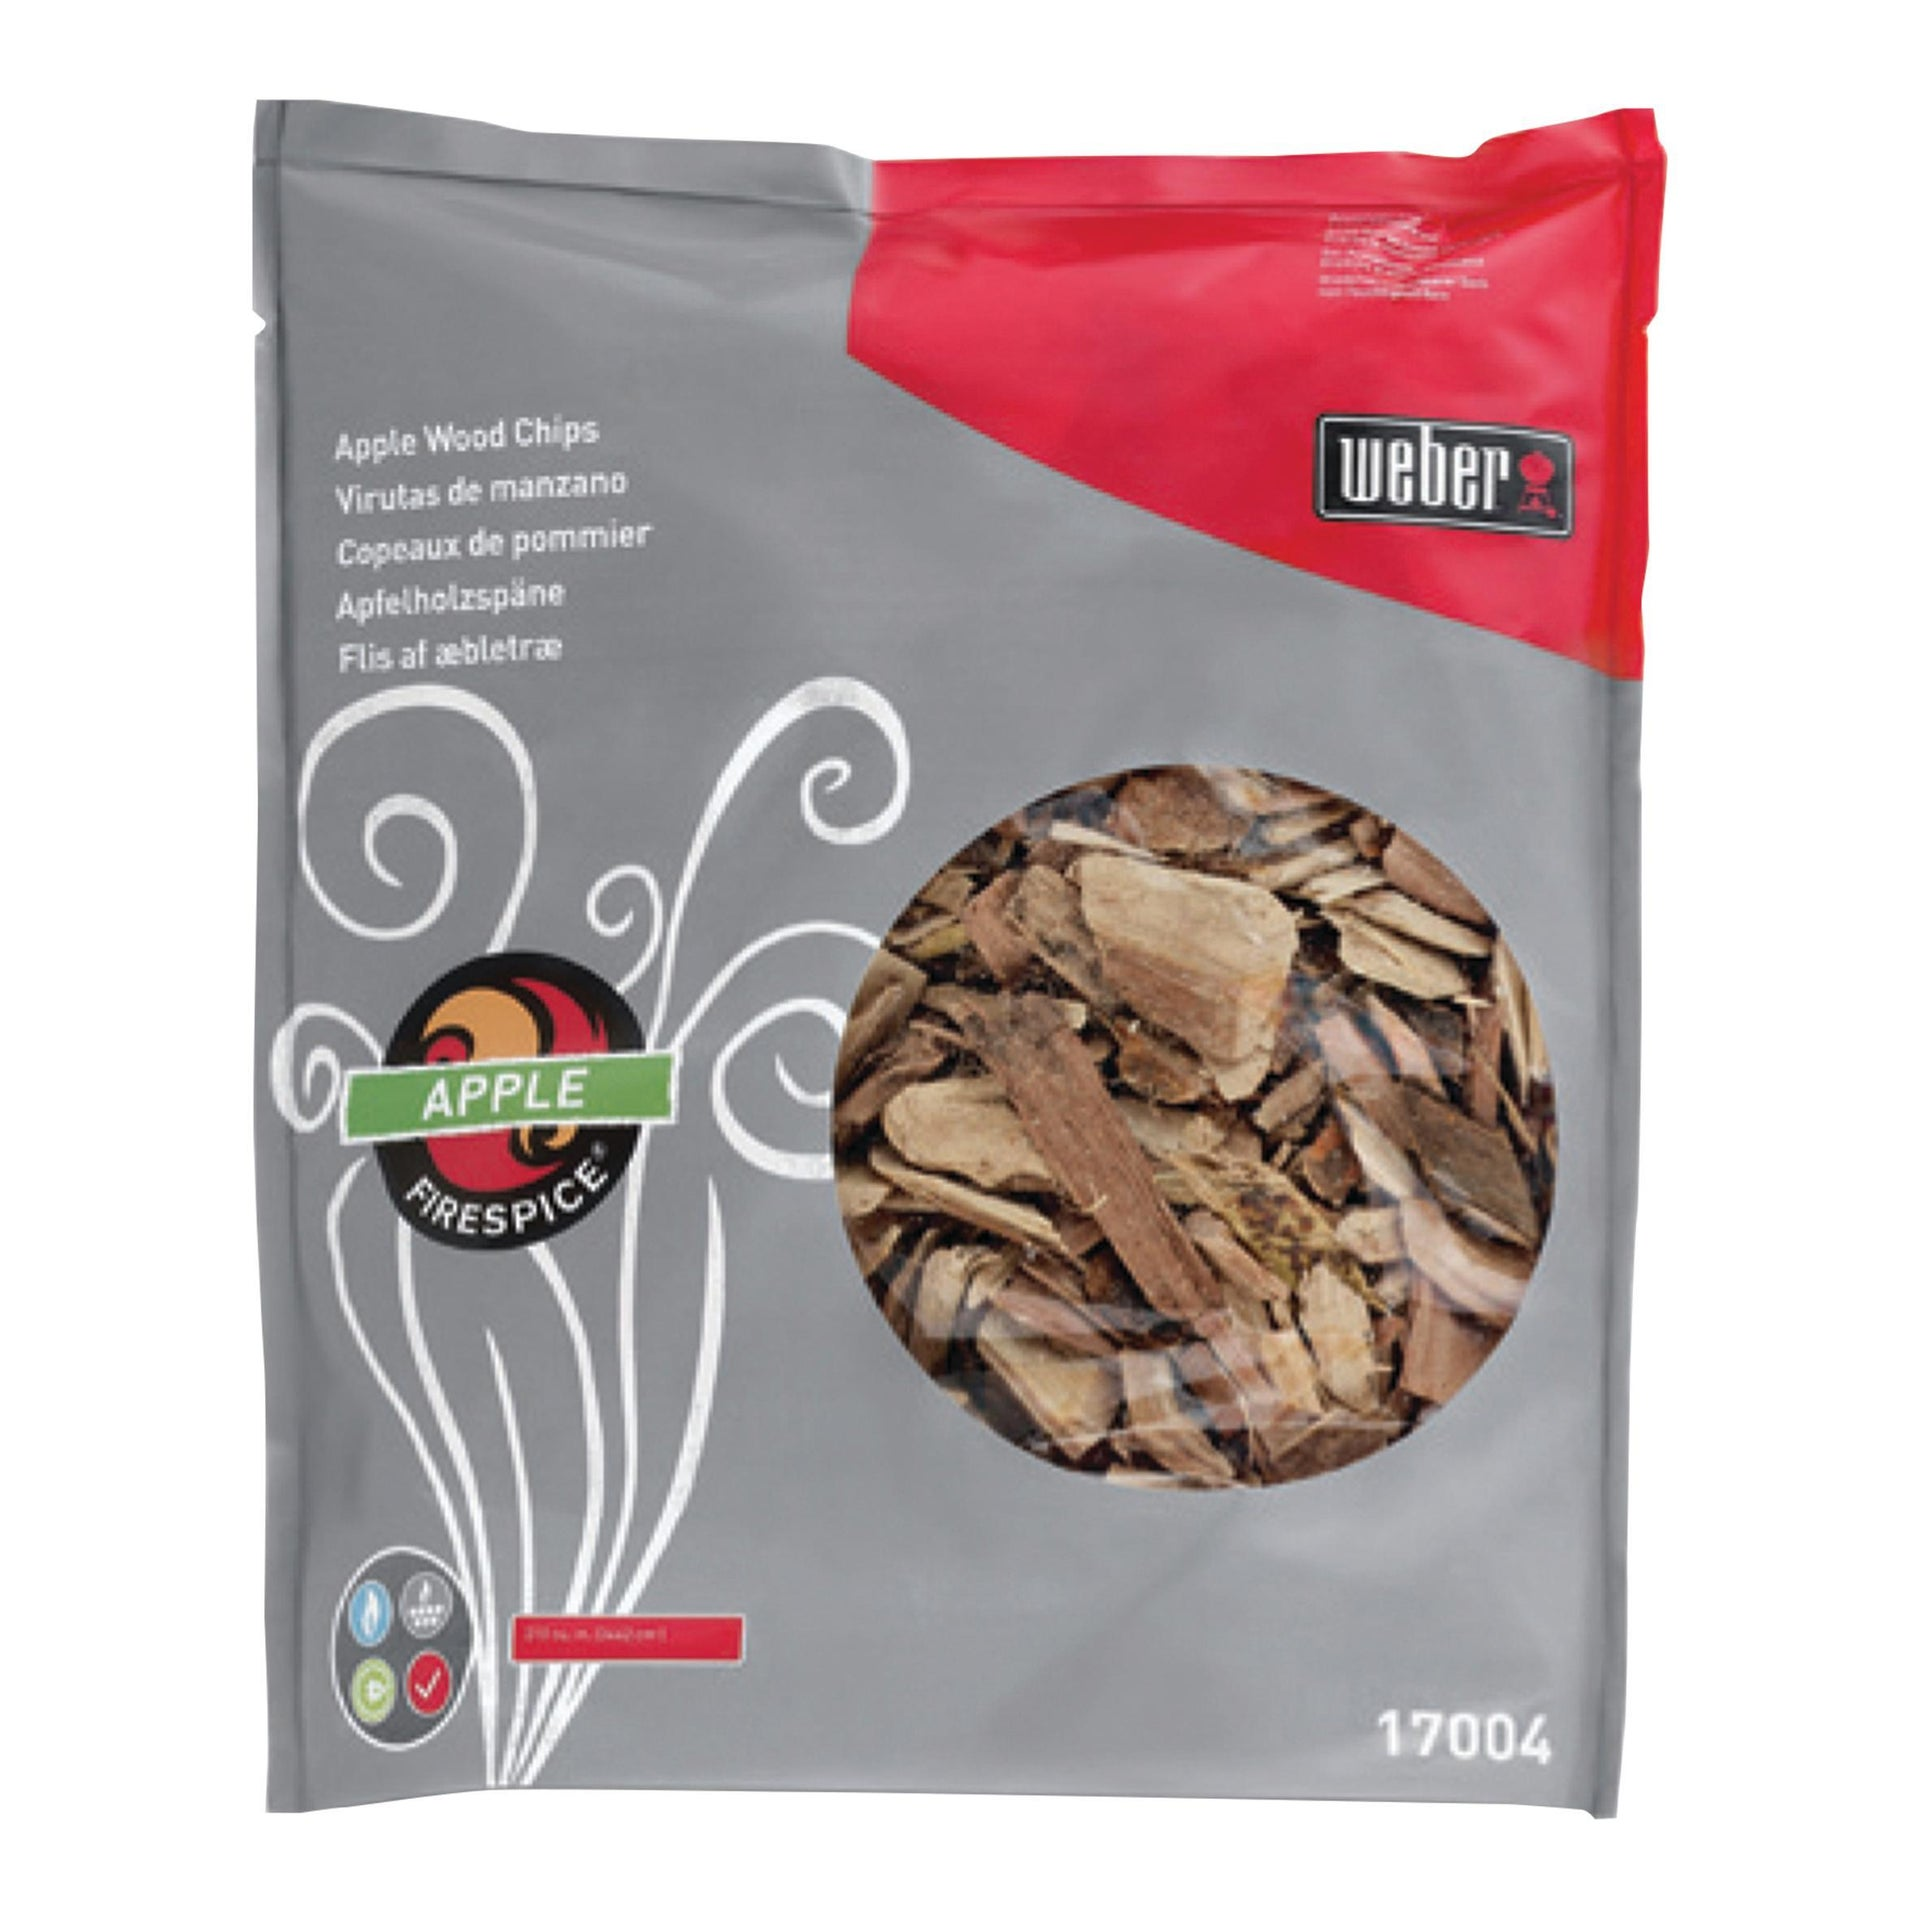 Truccioli di legno per affumicatura WEBER Melo 0.7 kg